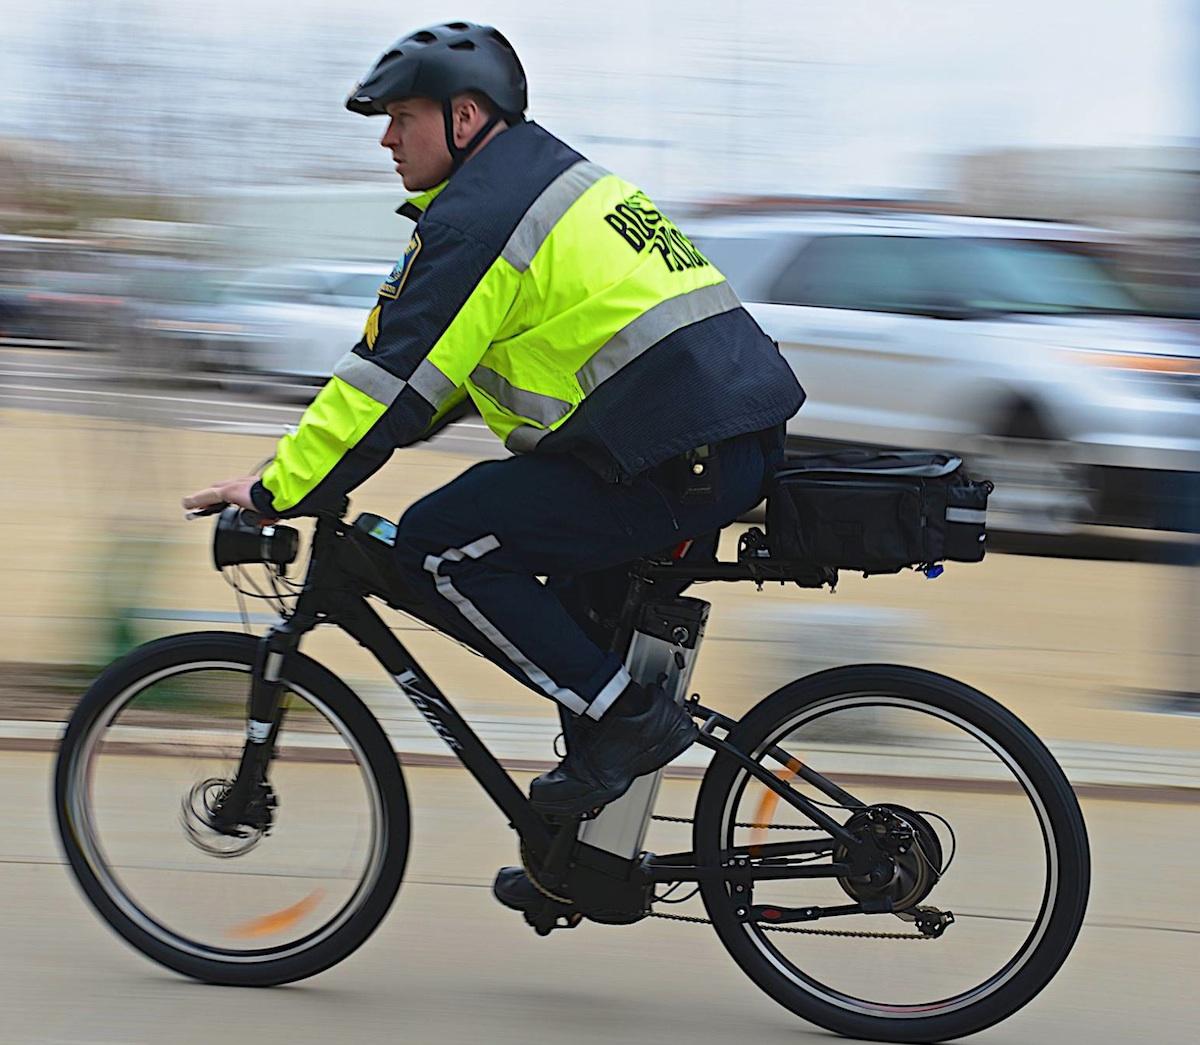 Image via Boston Police Department